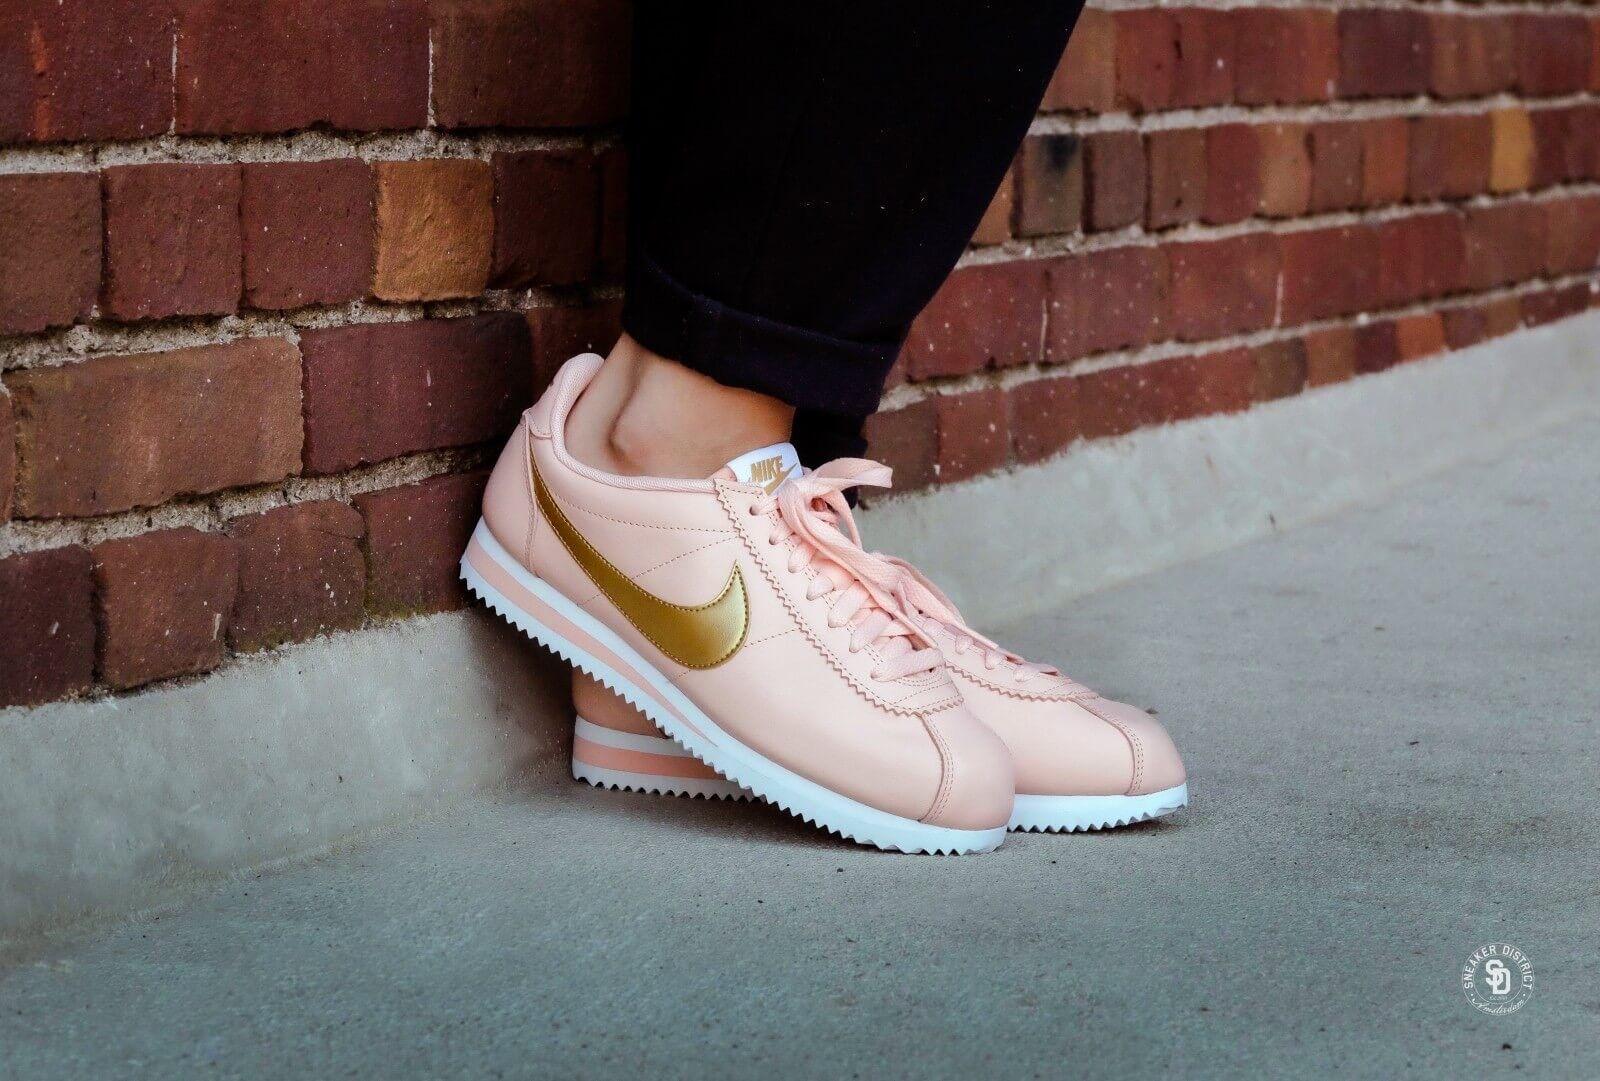 Reino Unido 6.5 Para Mujer Nike Classic Cortez Cortez Cortez Cuero Zapatillas Eur 40.5 US 9 807471-800 050d12